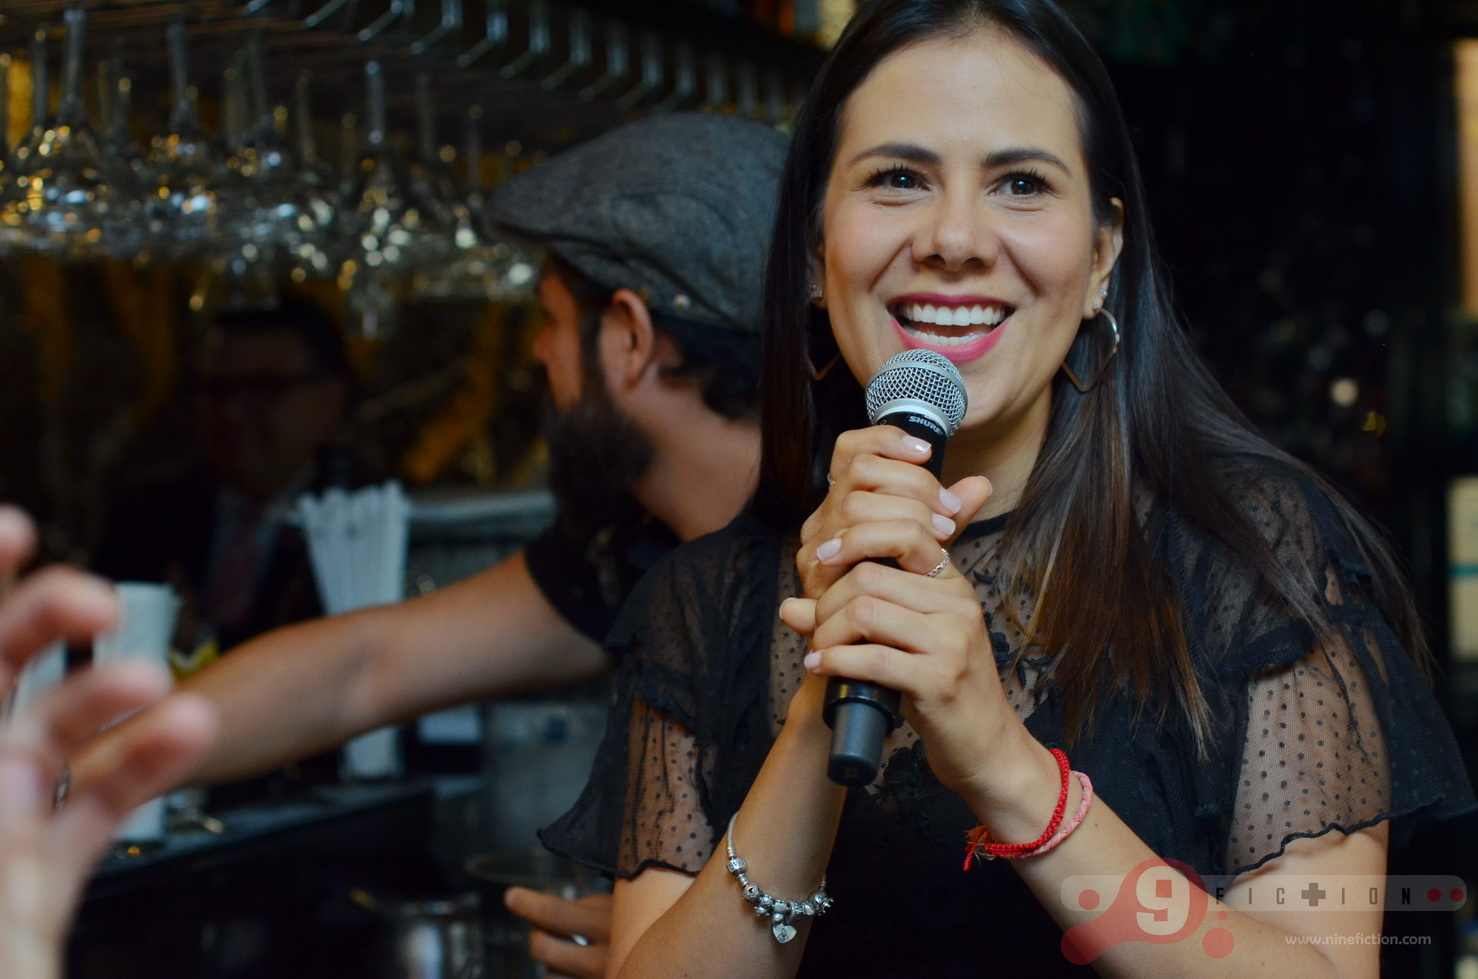 02 Cocteles Hard Rock Hotel GDL - 2019 - Foto Salvador Tabares - Nine Fiction 002